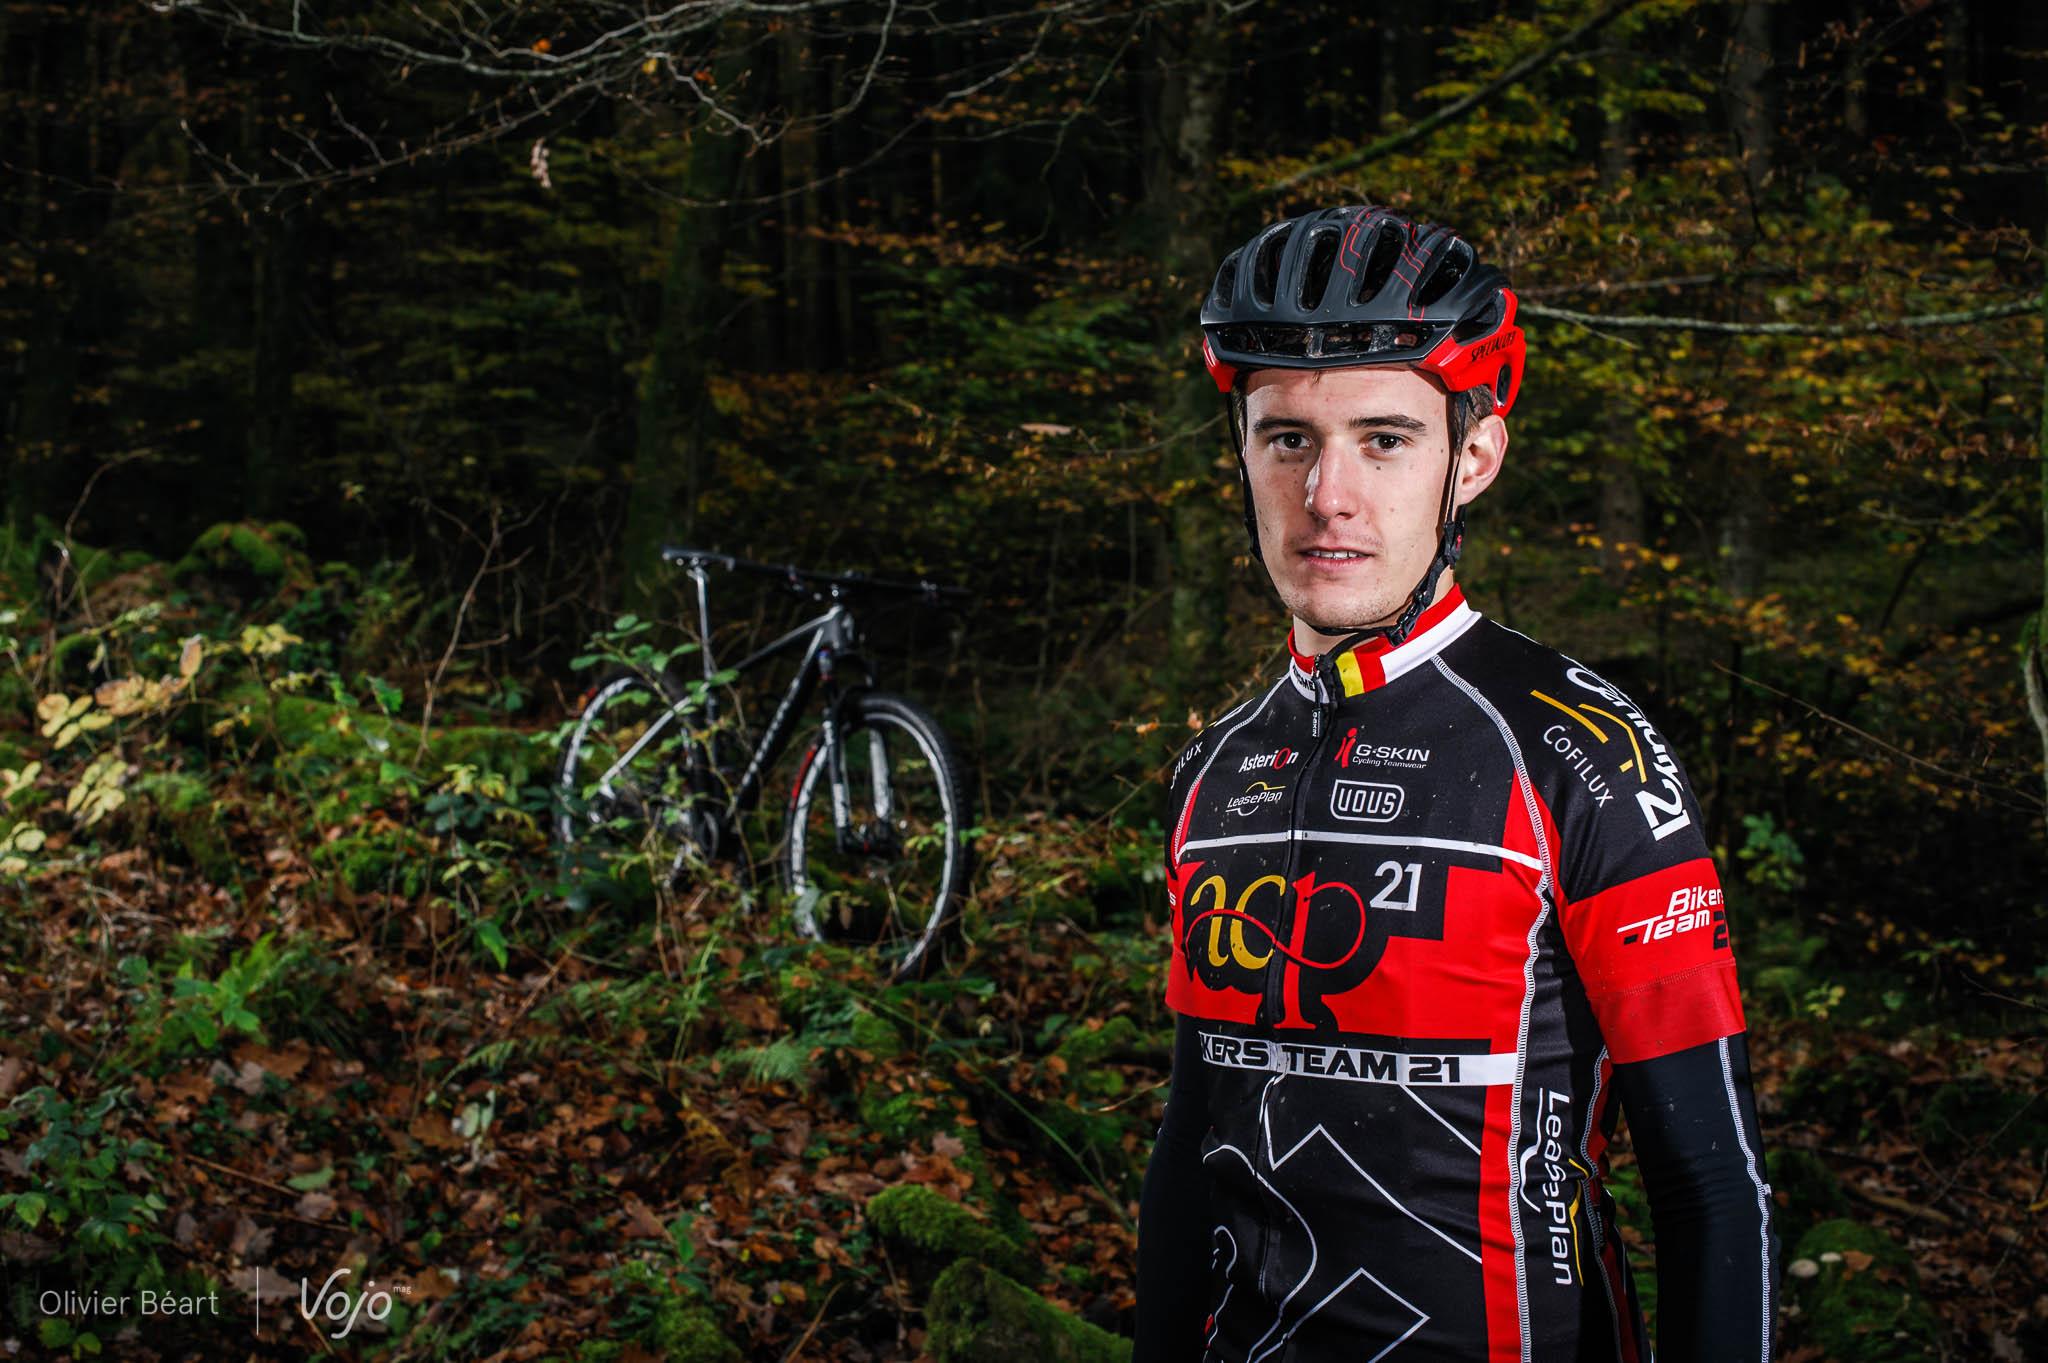 Epic_Bikers_Team21_Copyright_OBeart_VojoMag-16